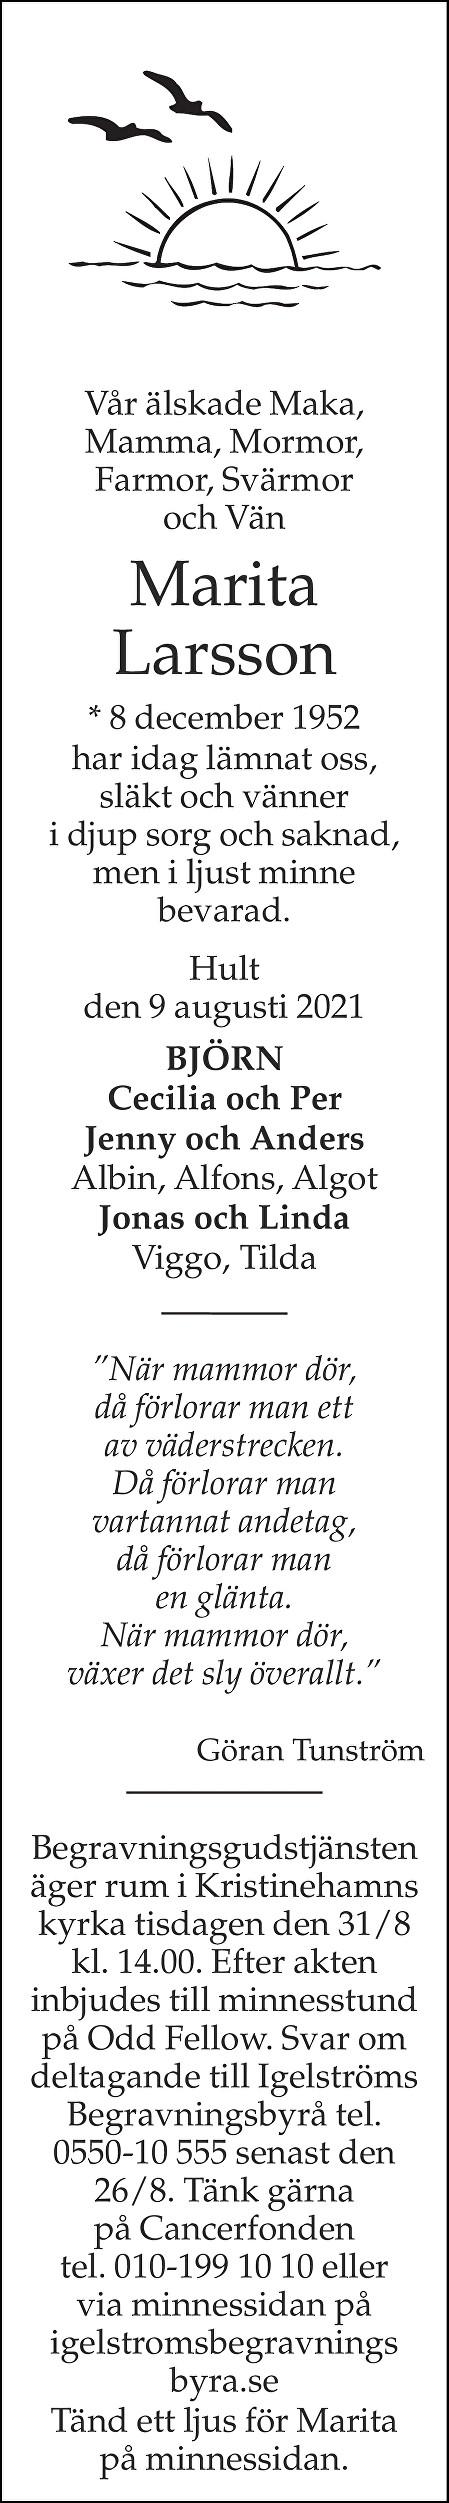 Marita Larsson Death notice